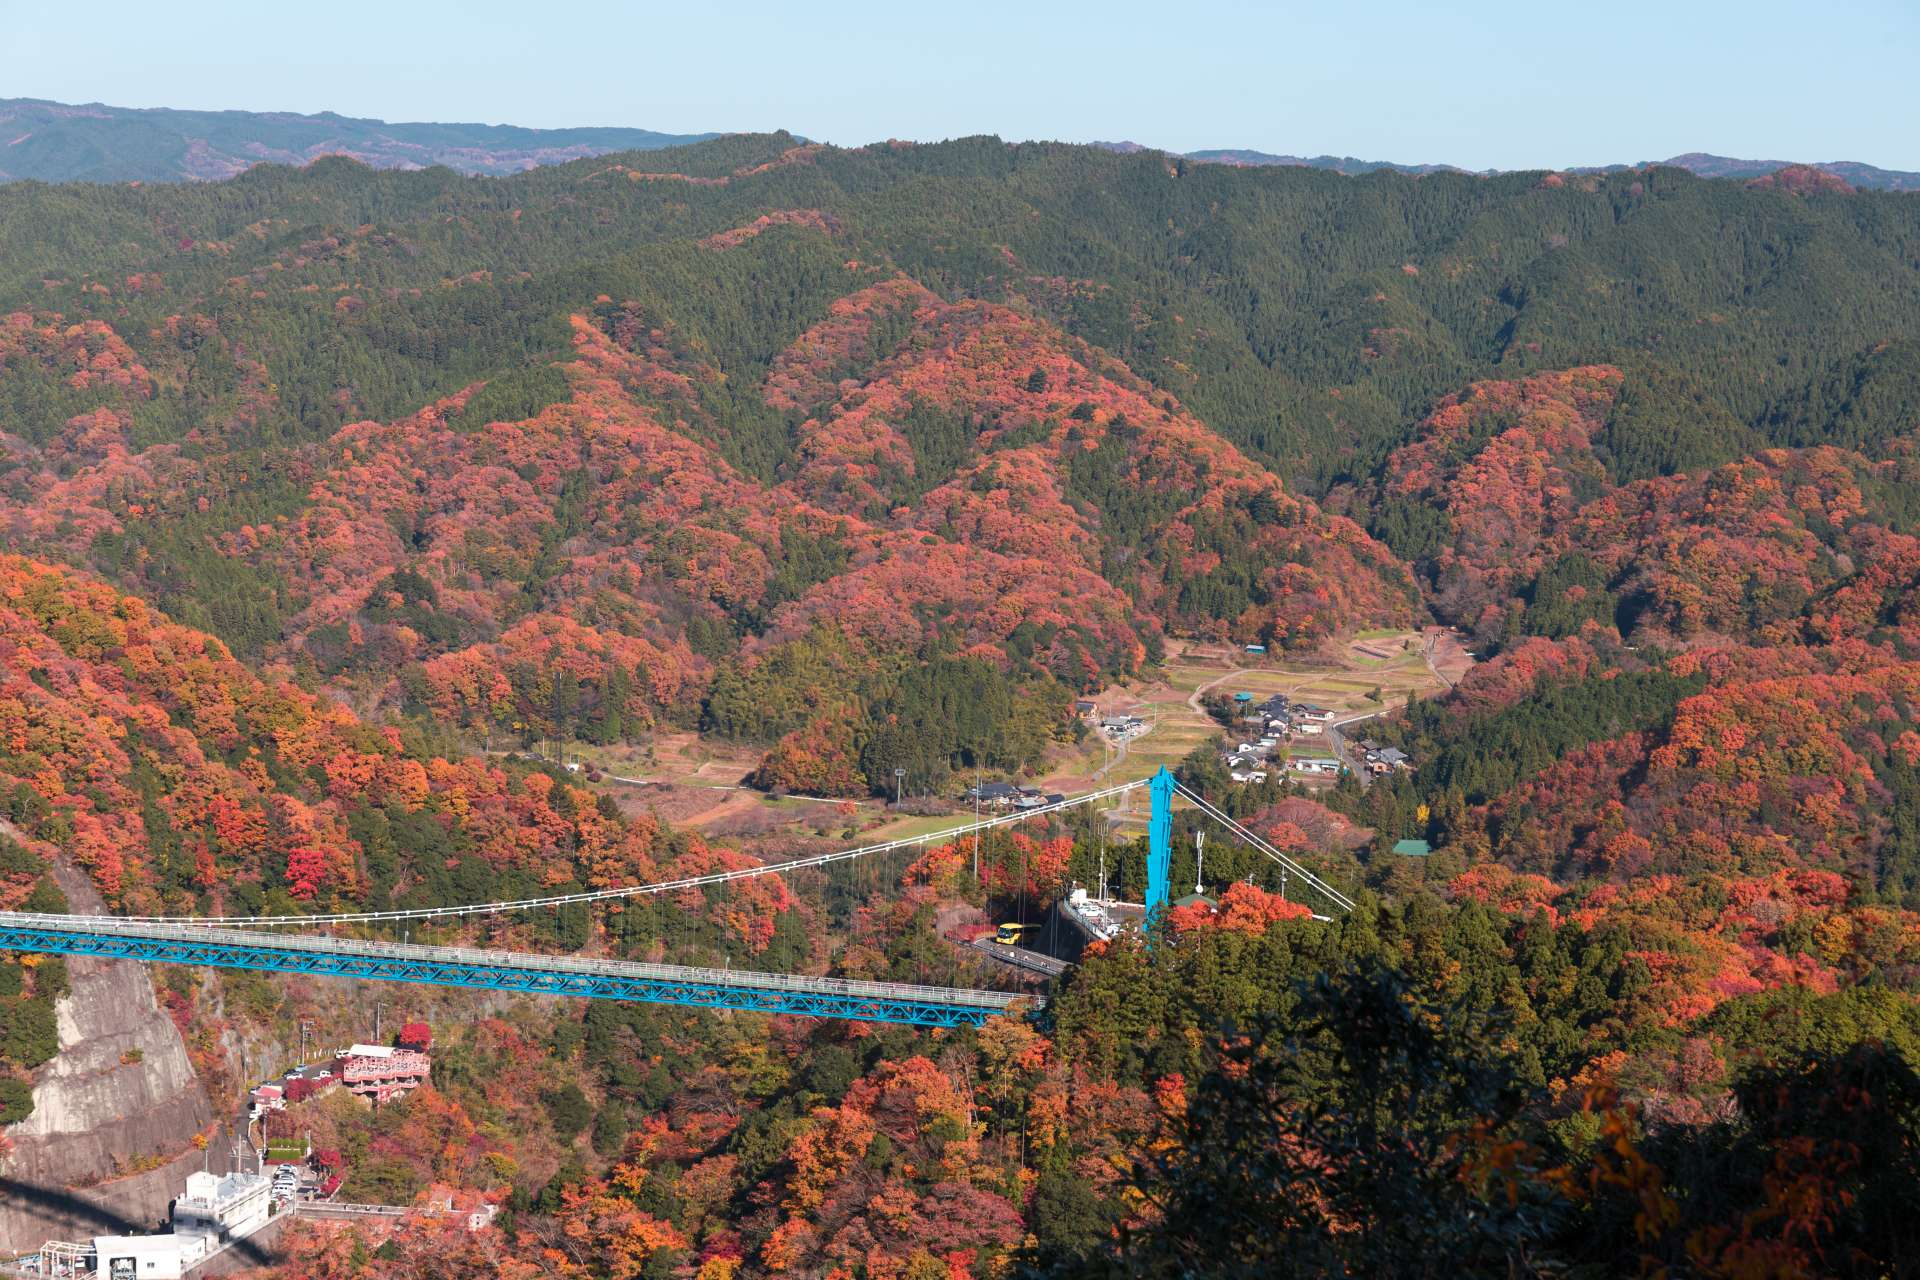 Ryujin Great Suspension Bridge, Autumn Leaves, Ryujin Dam